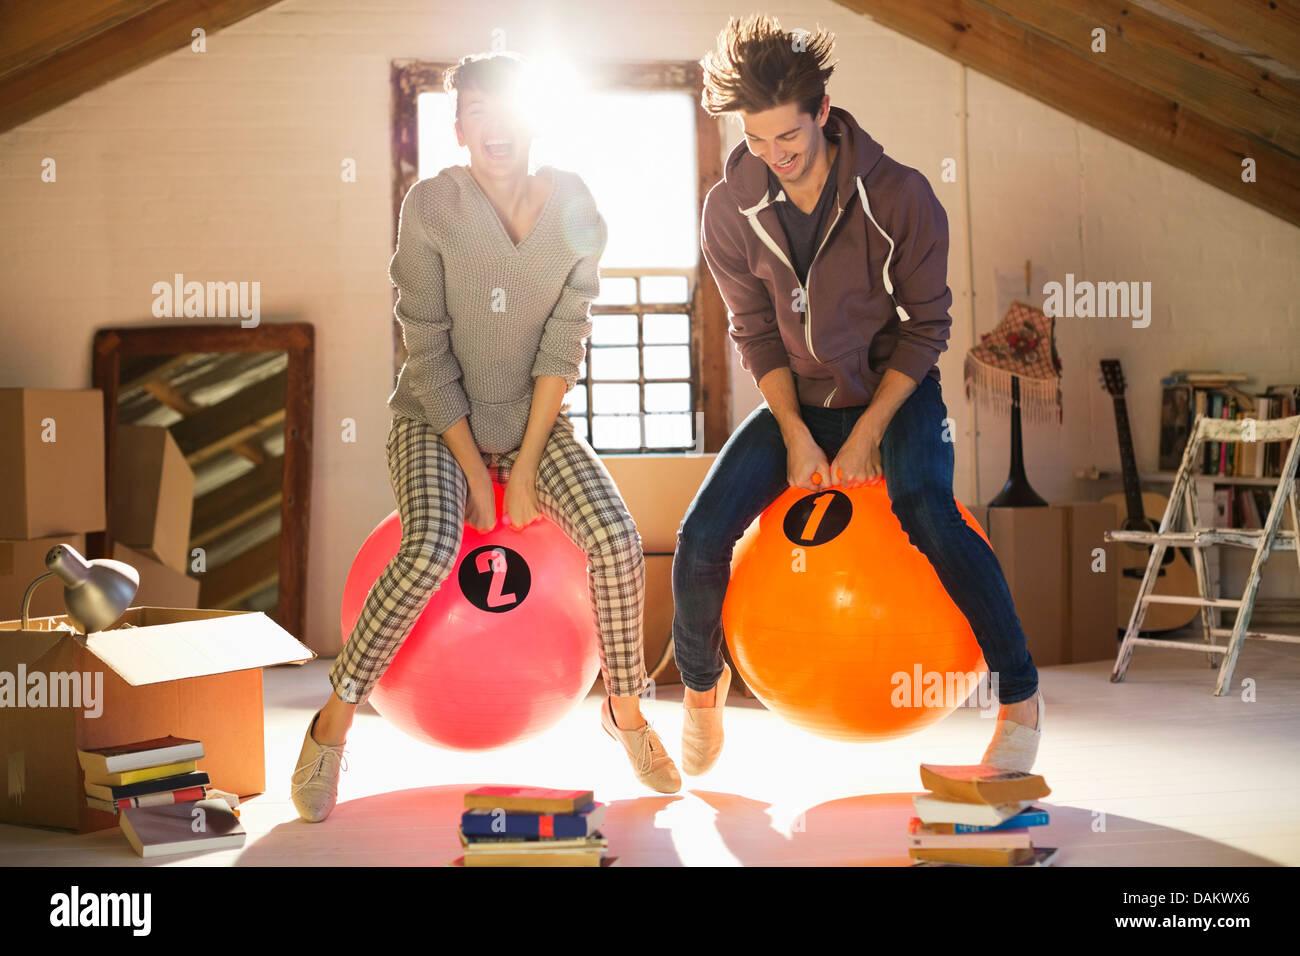 Casal saltando sobre as esferas de exercício em conjunto Imagens de Stock